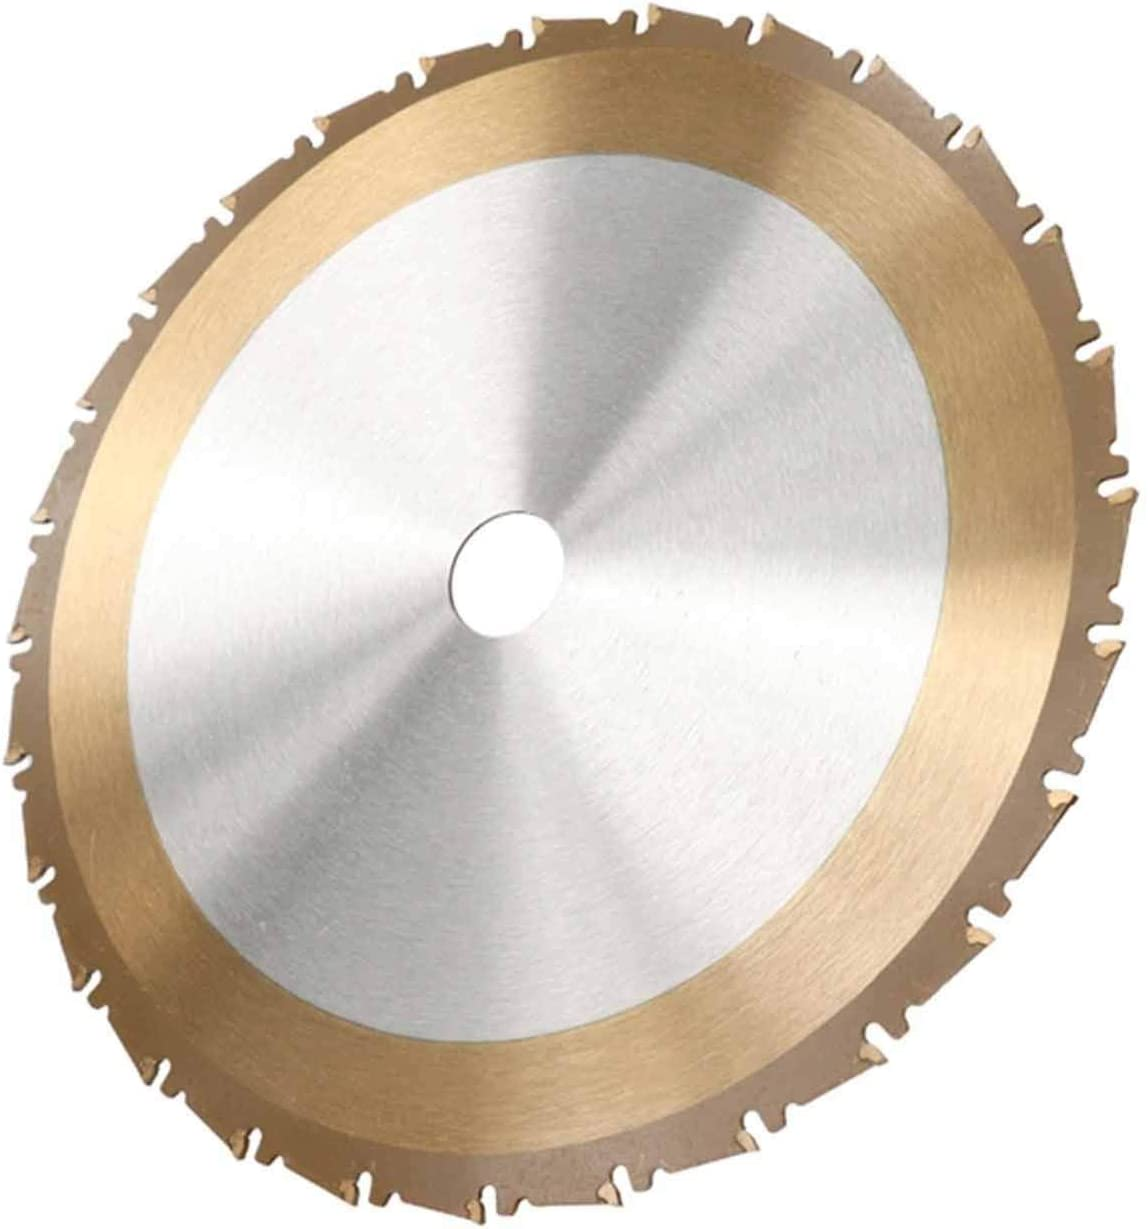 IINSSDJ Ranking integrated 1st place TCT Memphis Mall Coating Circular Saw Cutting Tipped Di Carbide Blade